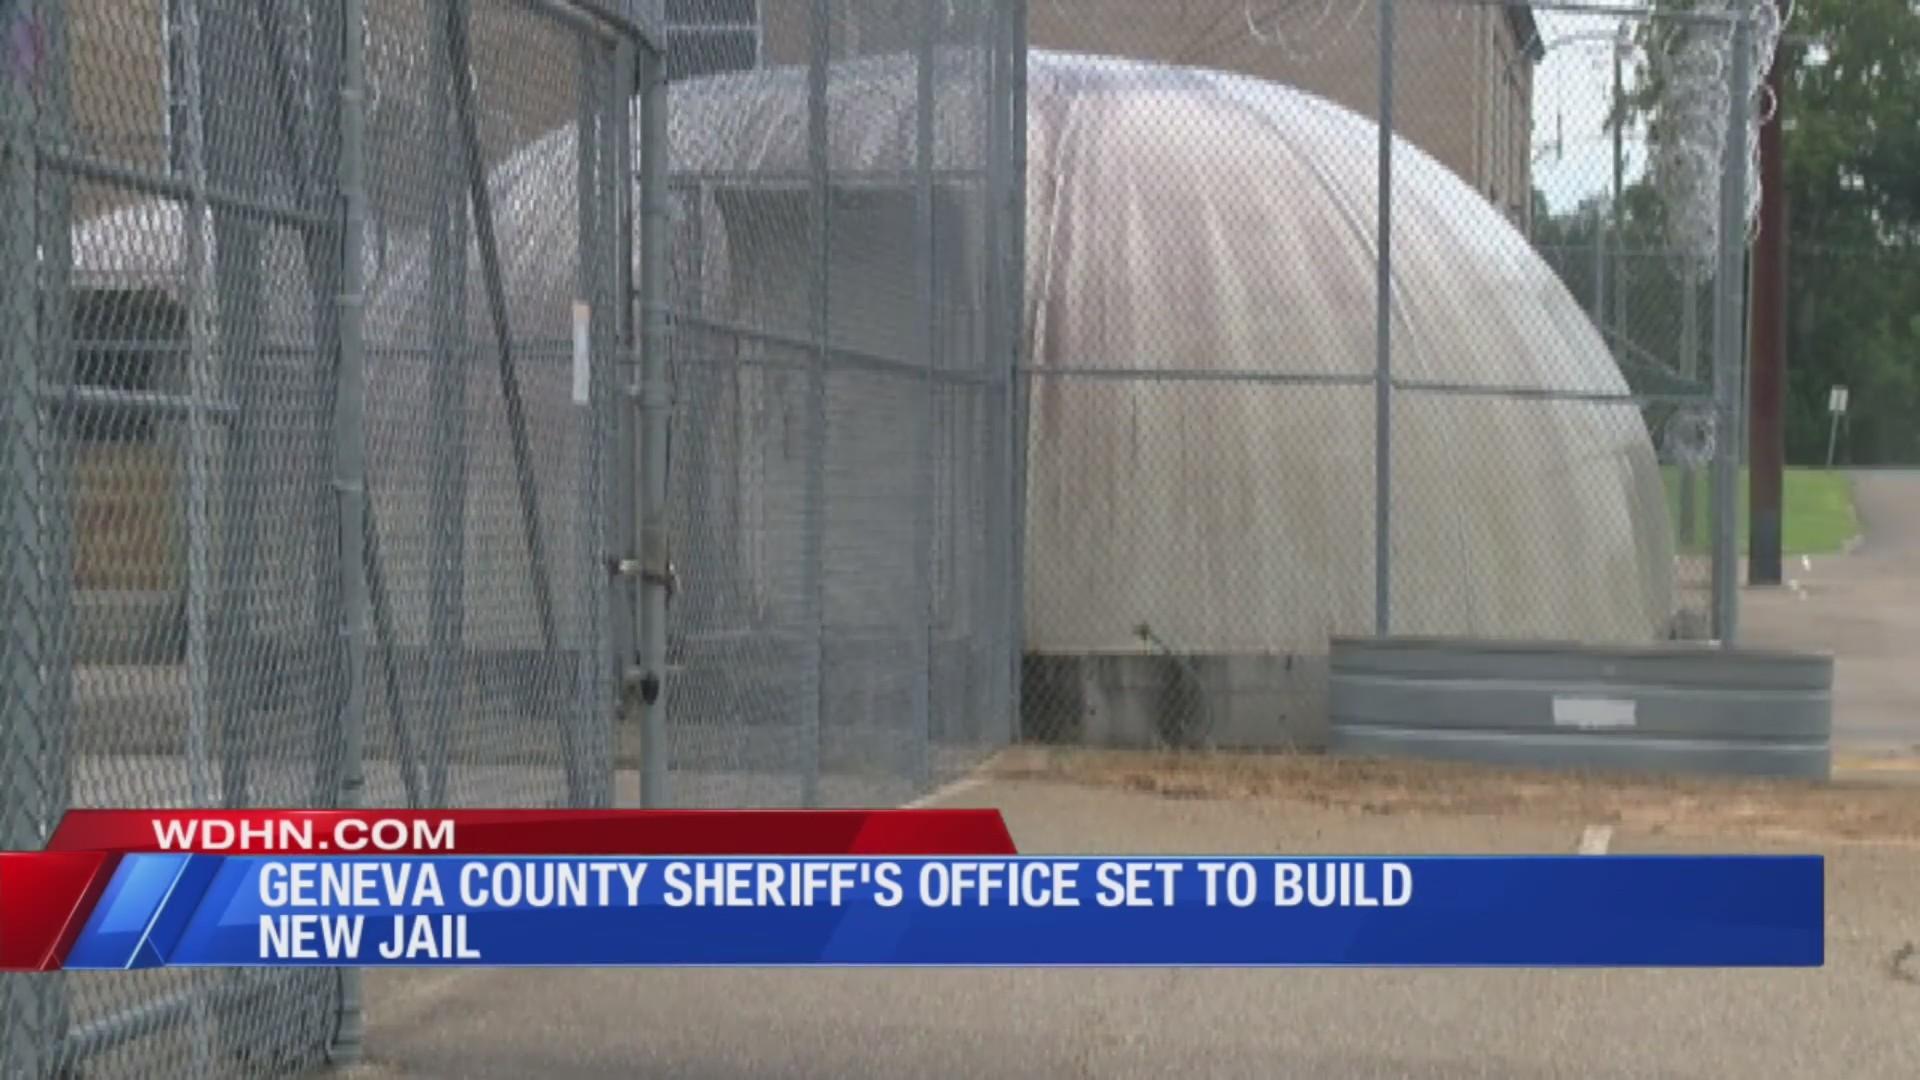 Geneva County Sheriff's Office building new jail